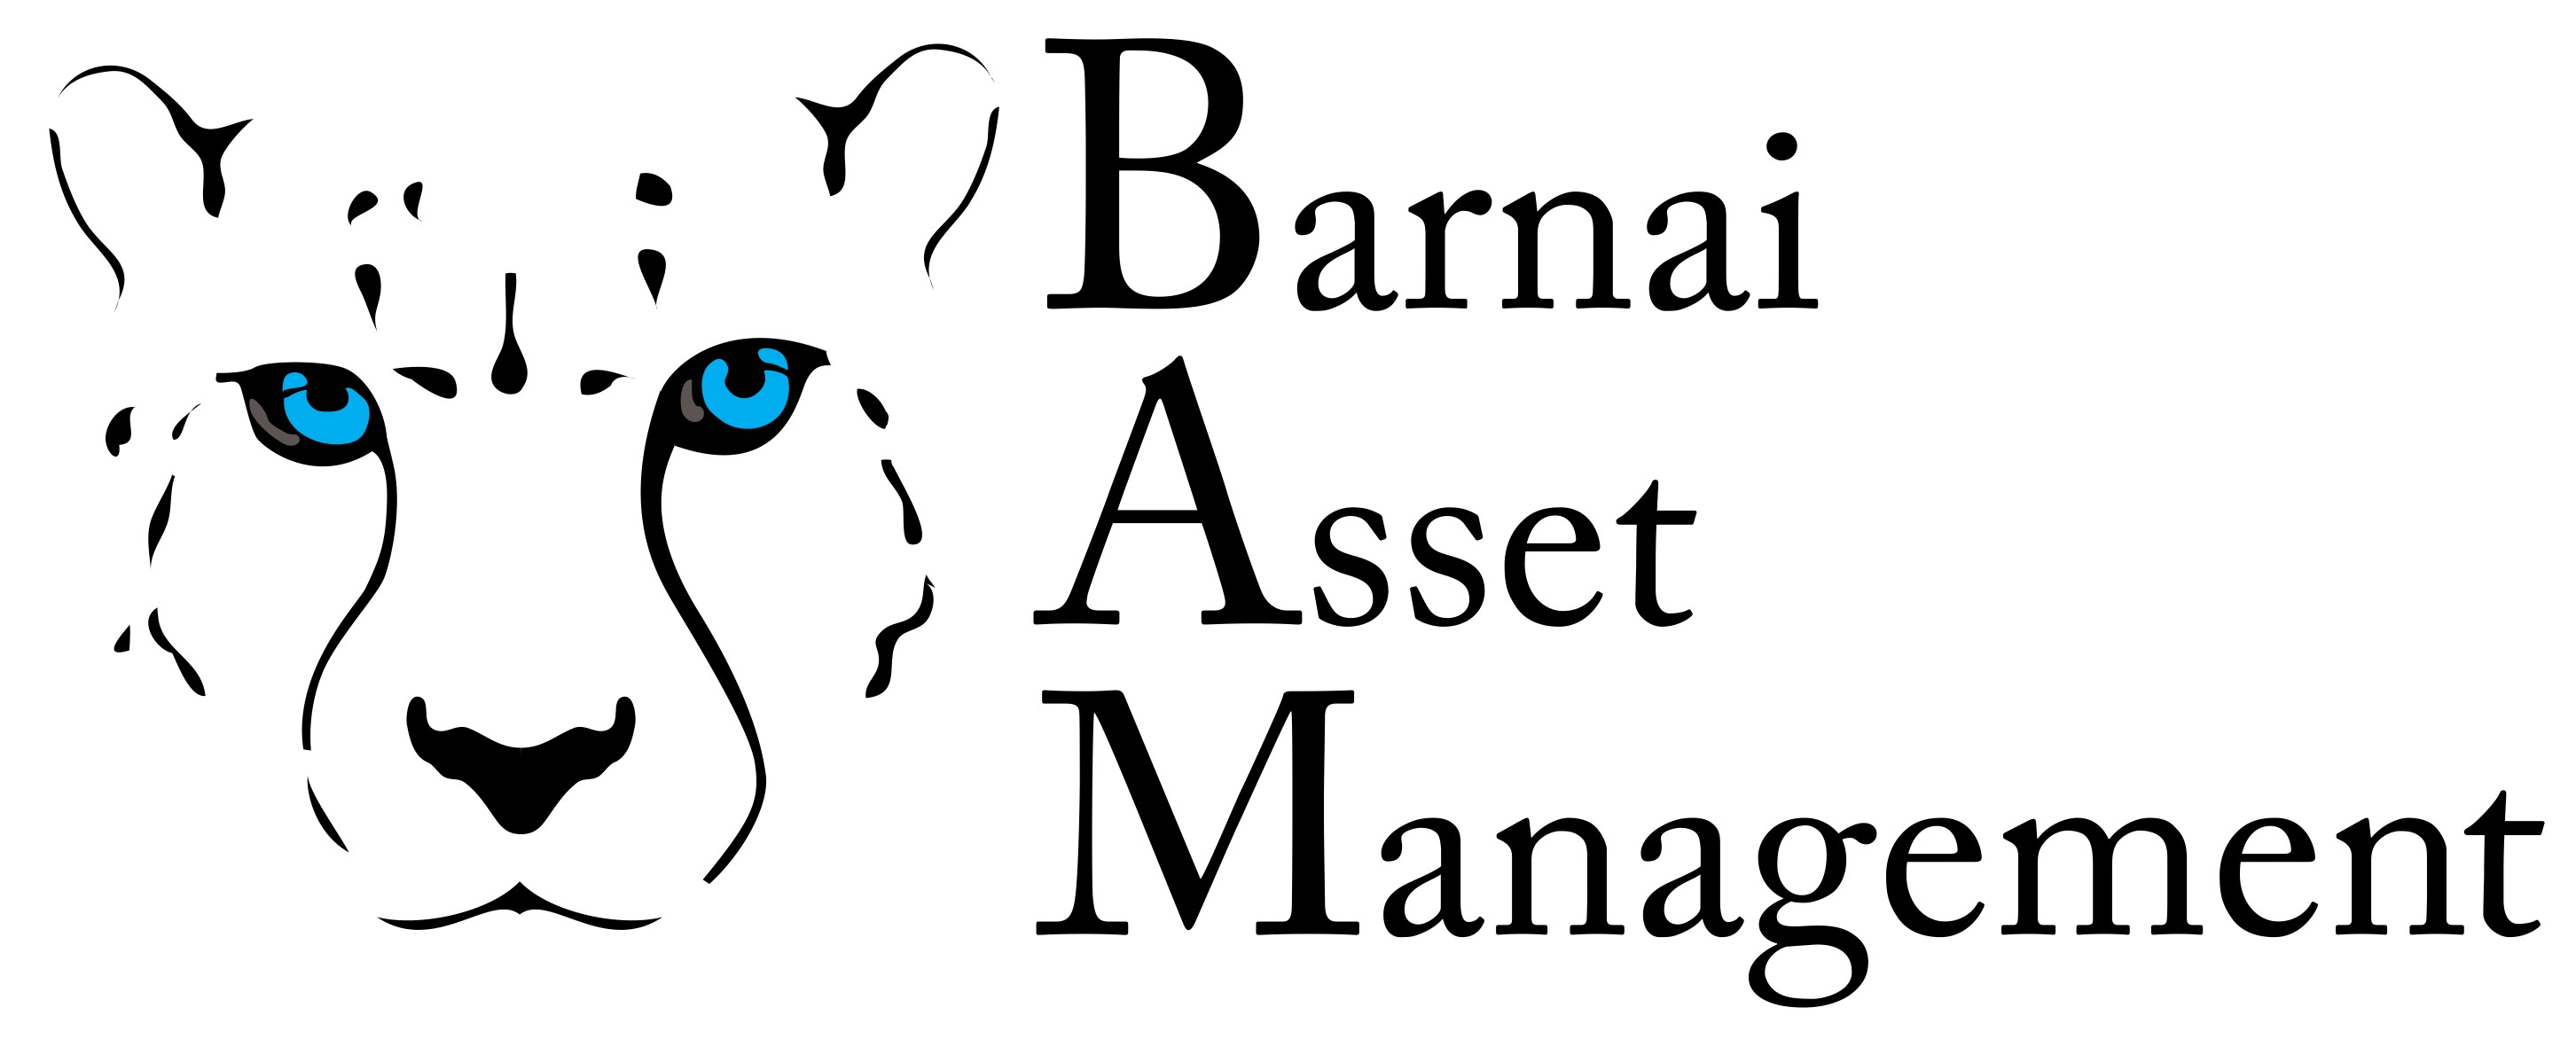 Barnai Asset Management